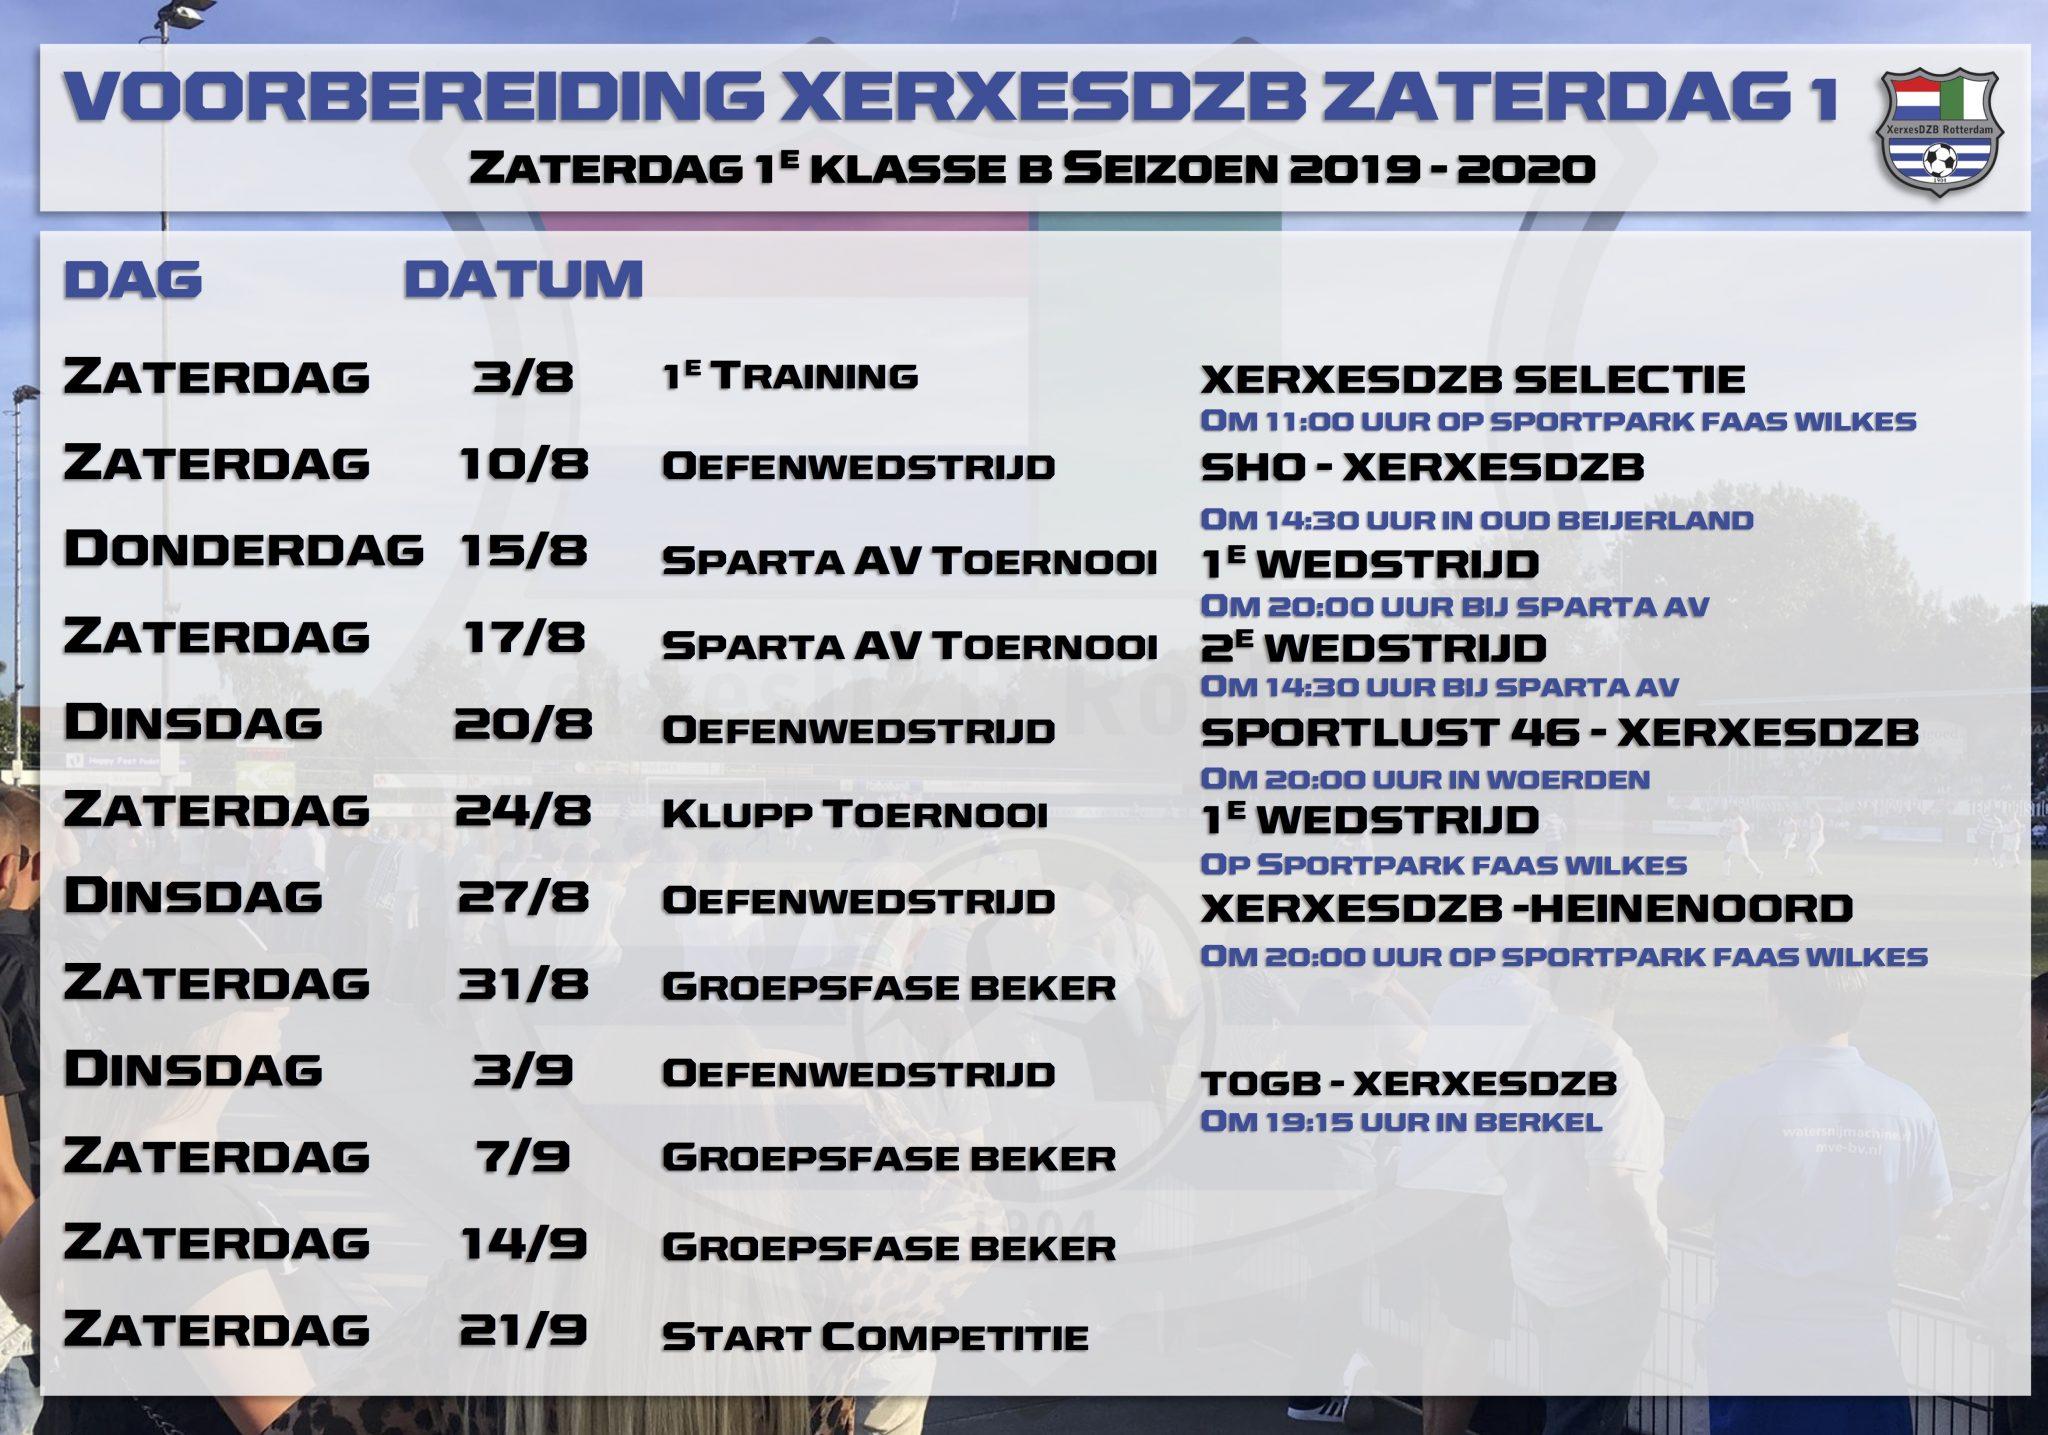 Programma voorbereiding XerxesDZB zaterdag selectie